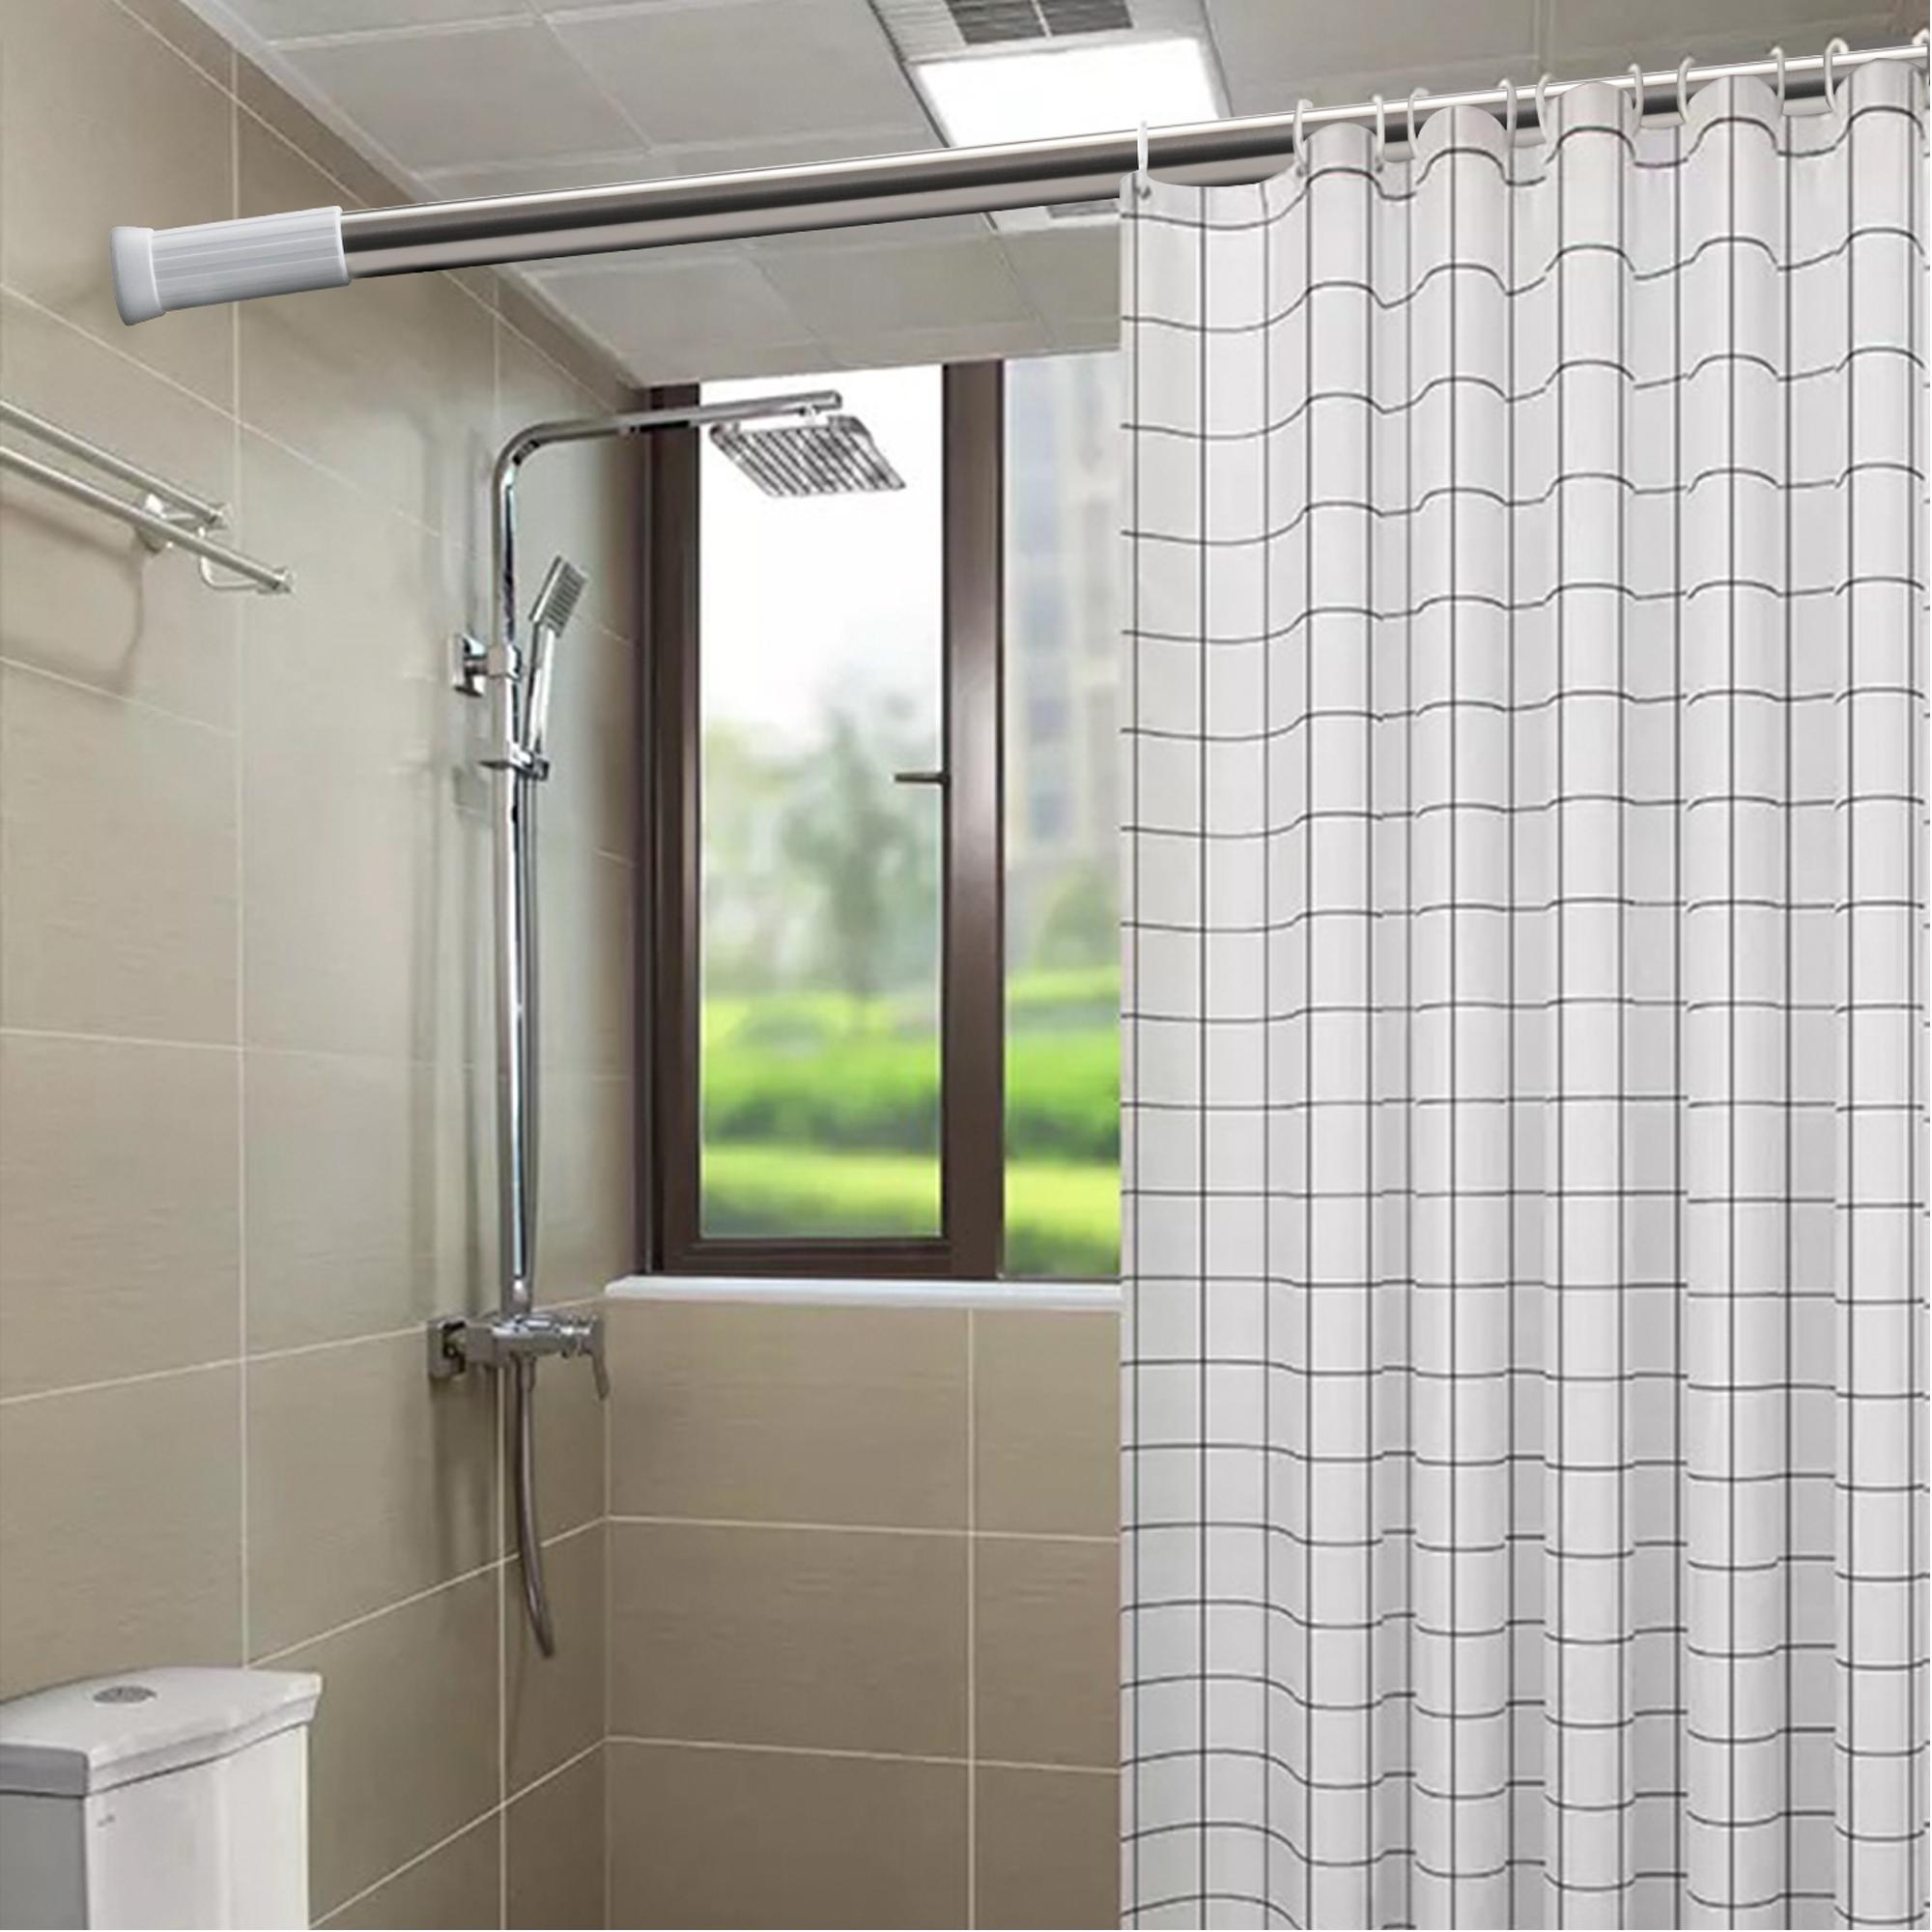 QJMAX Rust Proof SS Shower Curtain Tension Rod, Adjustable Bathroom Stall Tension Pole